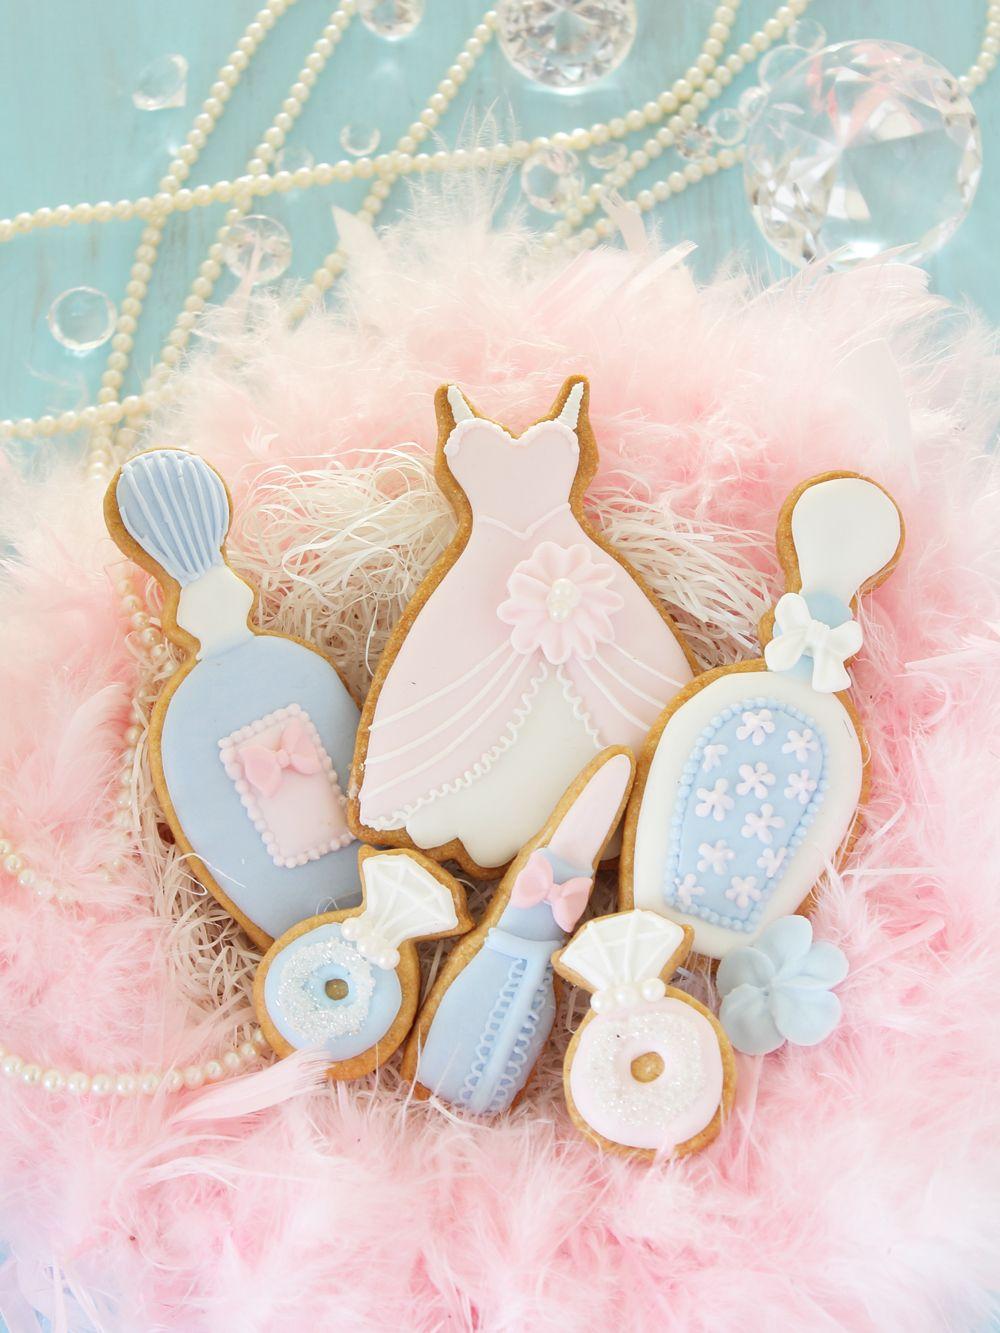 cookie/cookies/icing/icingcookie/icingcookies/royalicing/sugar/sugardecoration/ biscoitosdecorados/biscoitosdecorados/edibleart/アイシングクッキー/アイシング/クッキー